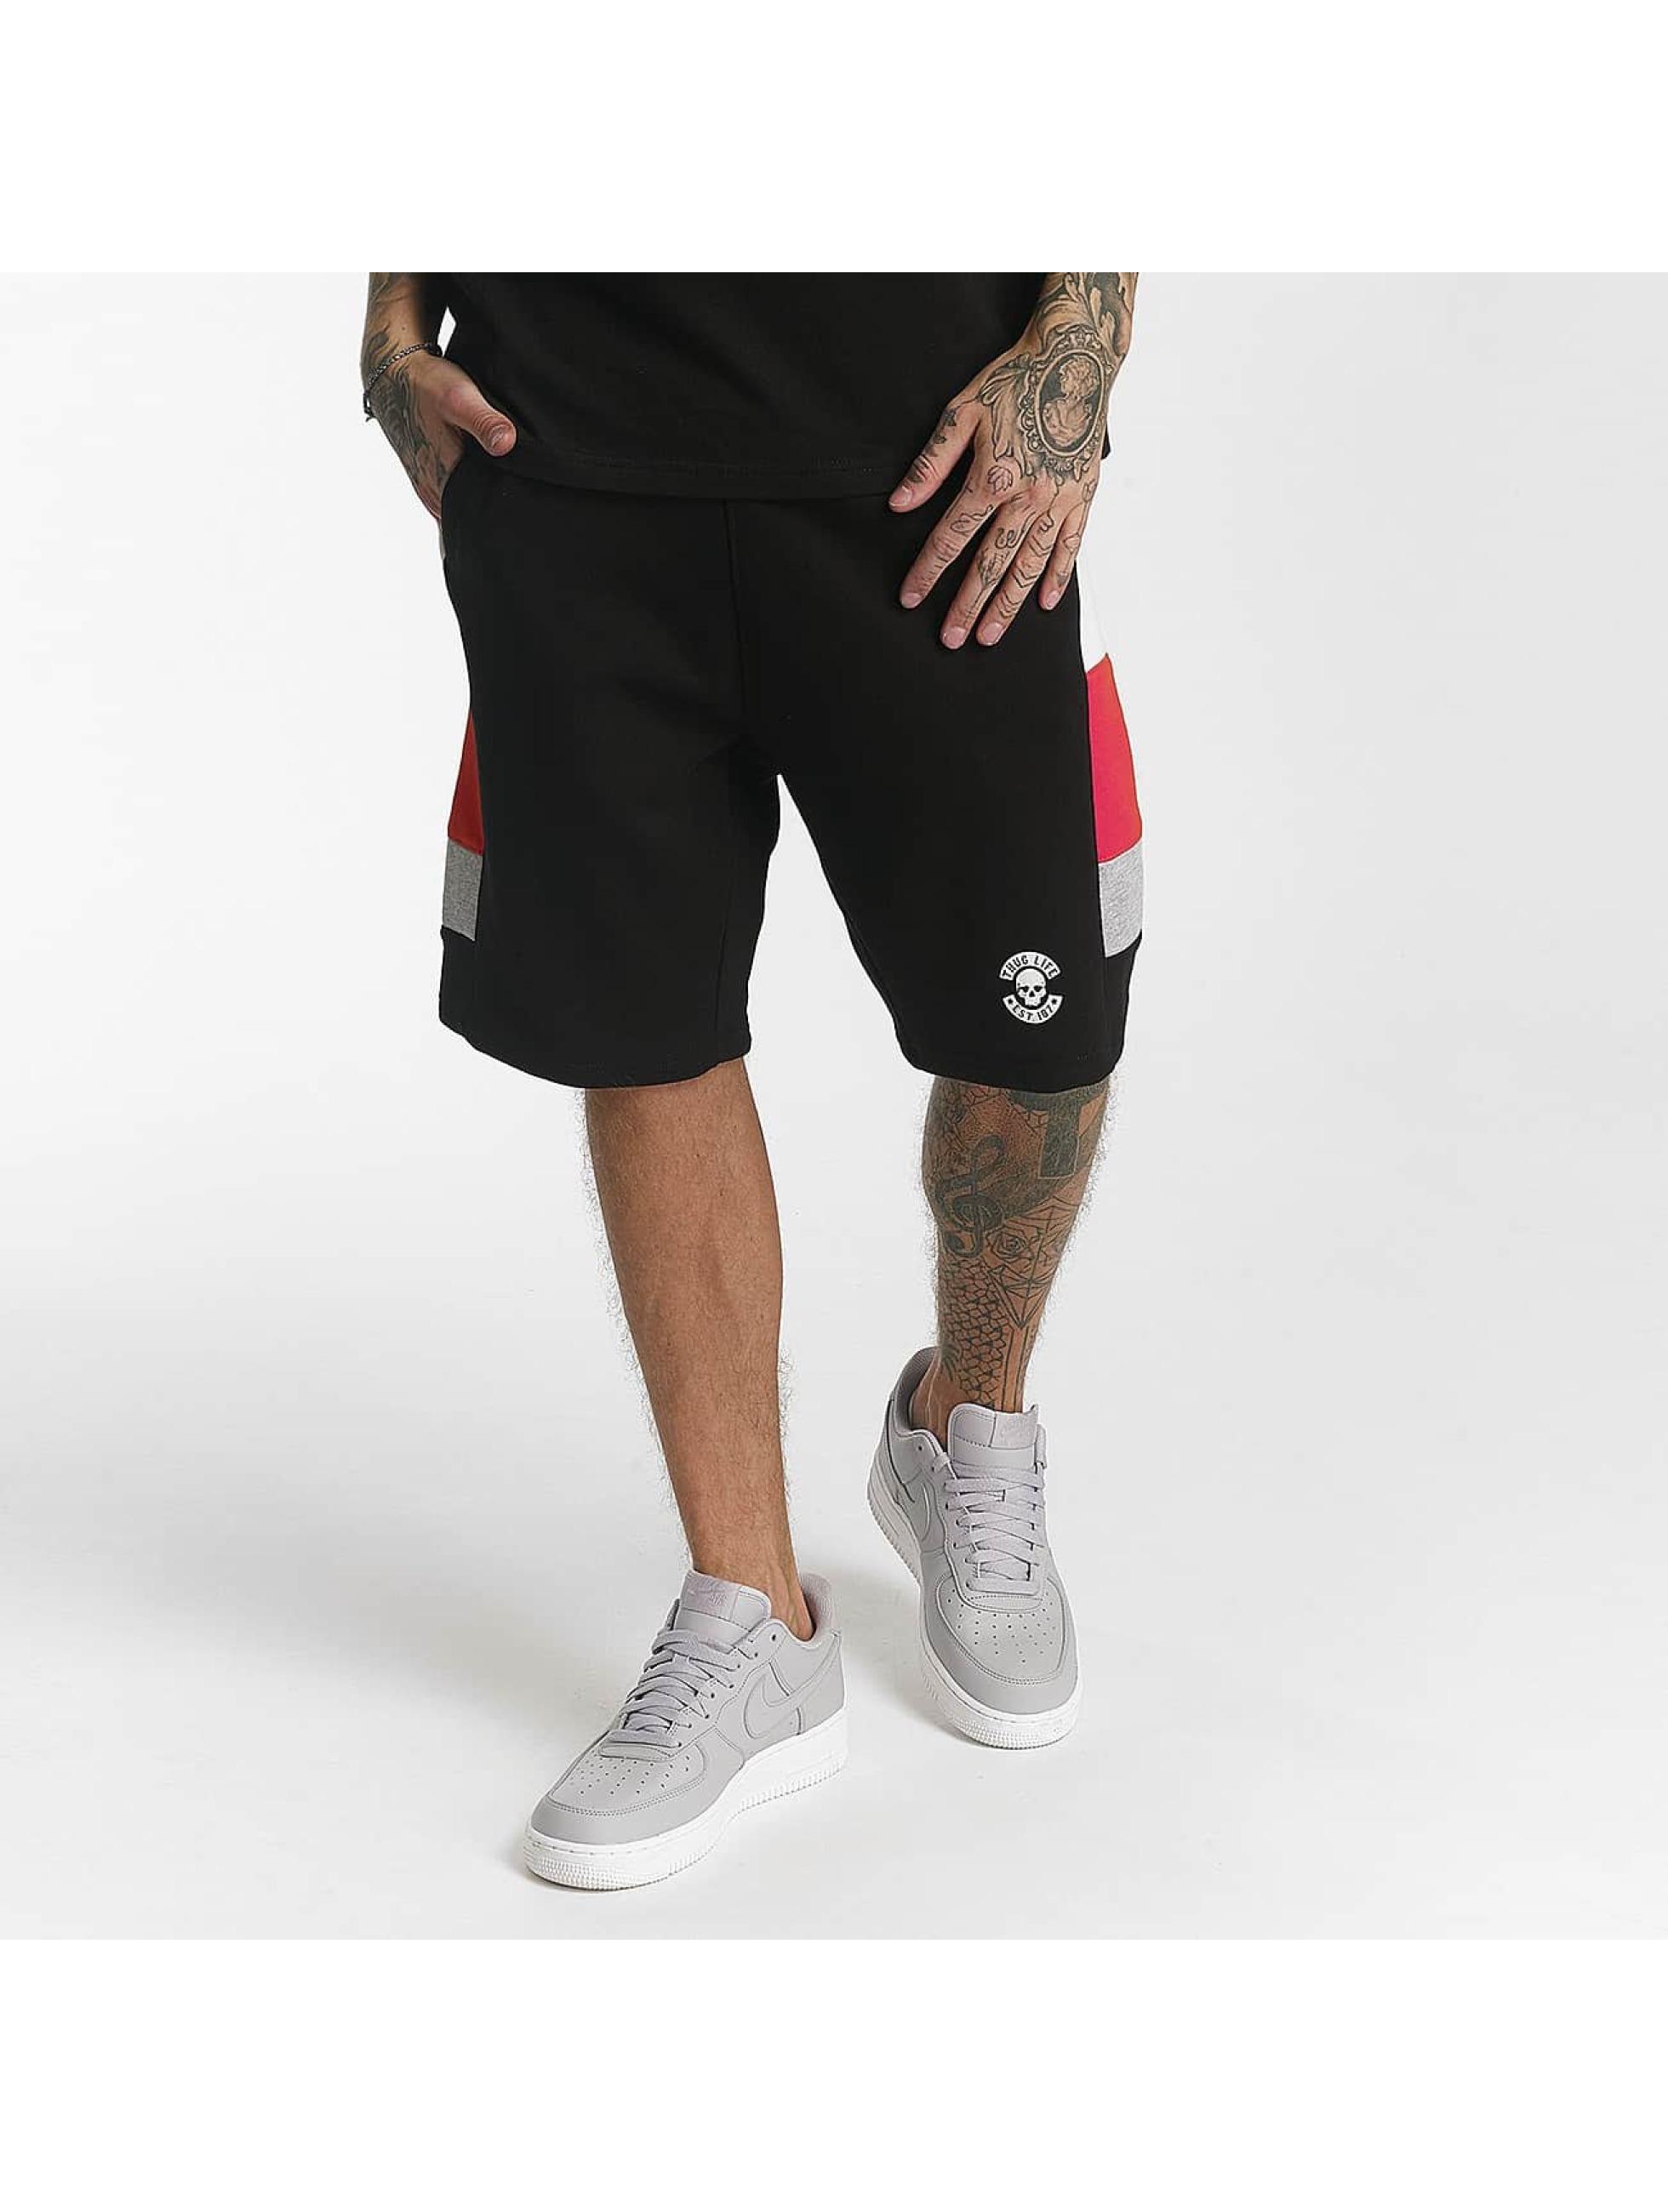 Thug Life / Short Leopard in black XL